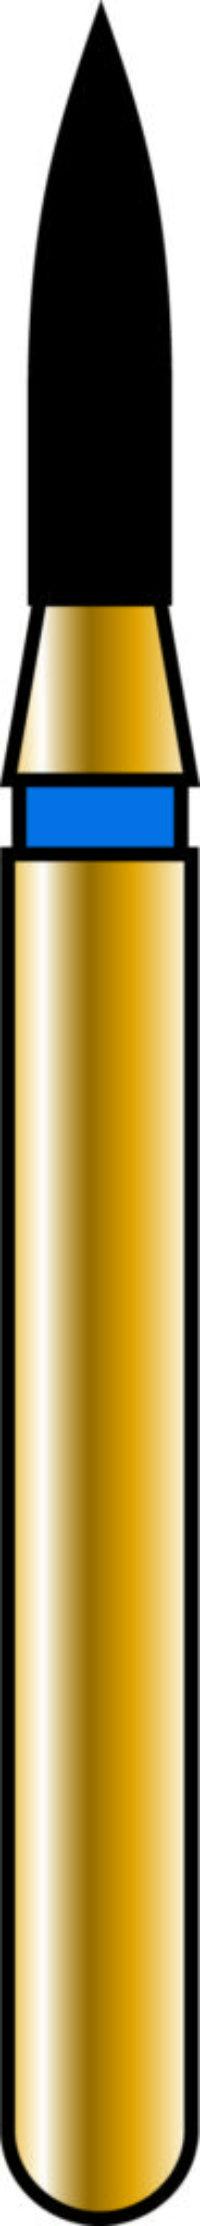 Flame 12-5mm Gold Diamond Bur